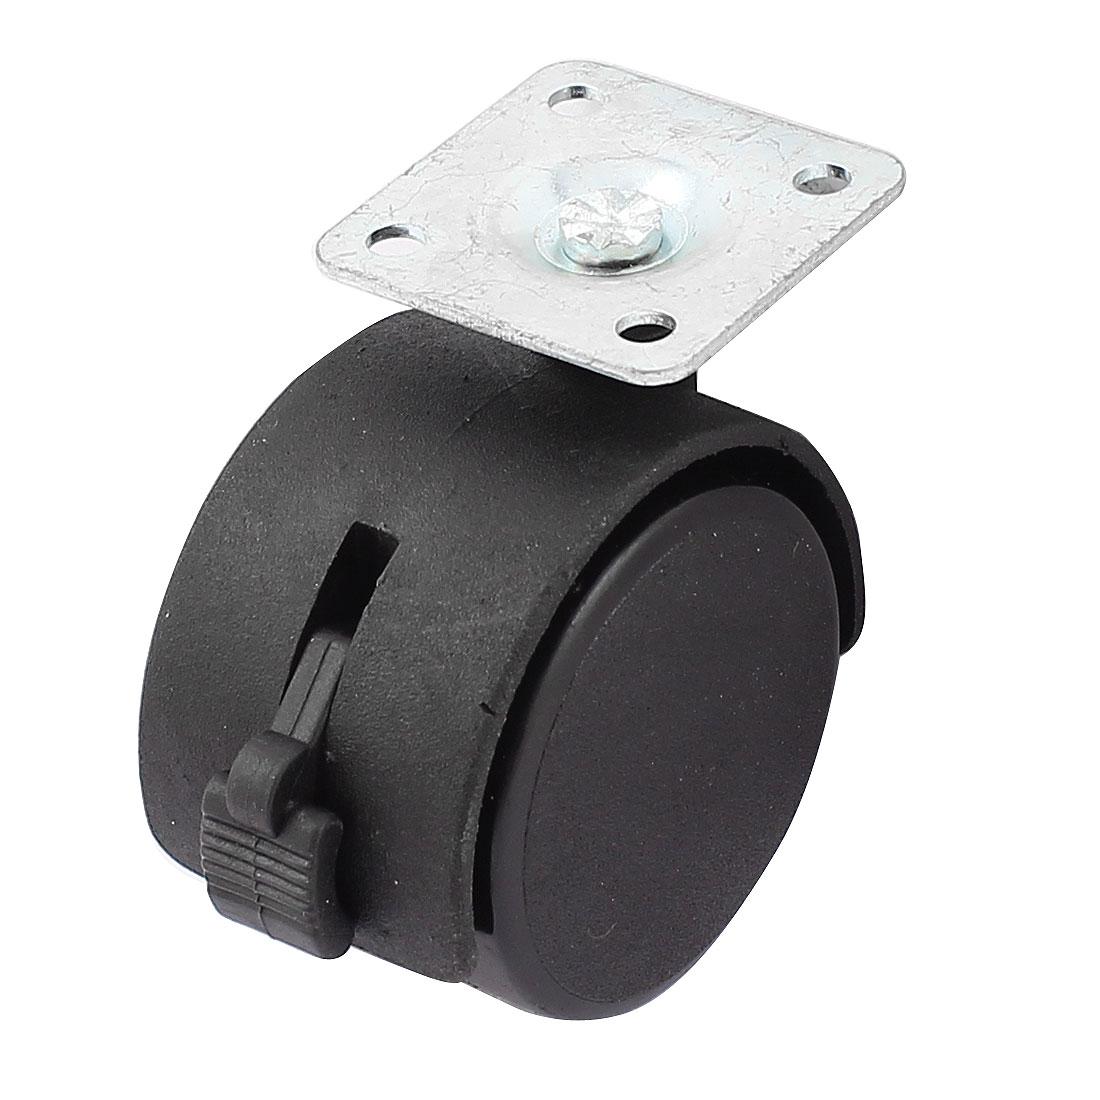 2Pcs Furniture Square Metal Mount Plate Black Twin Wheel Swivel Caster